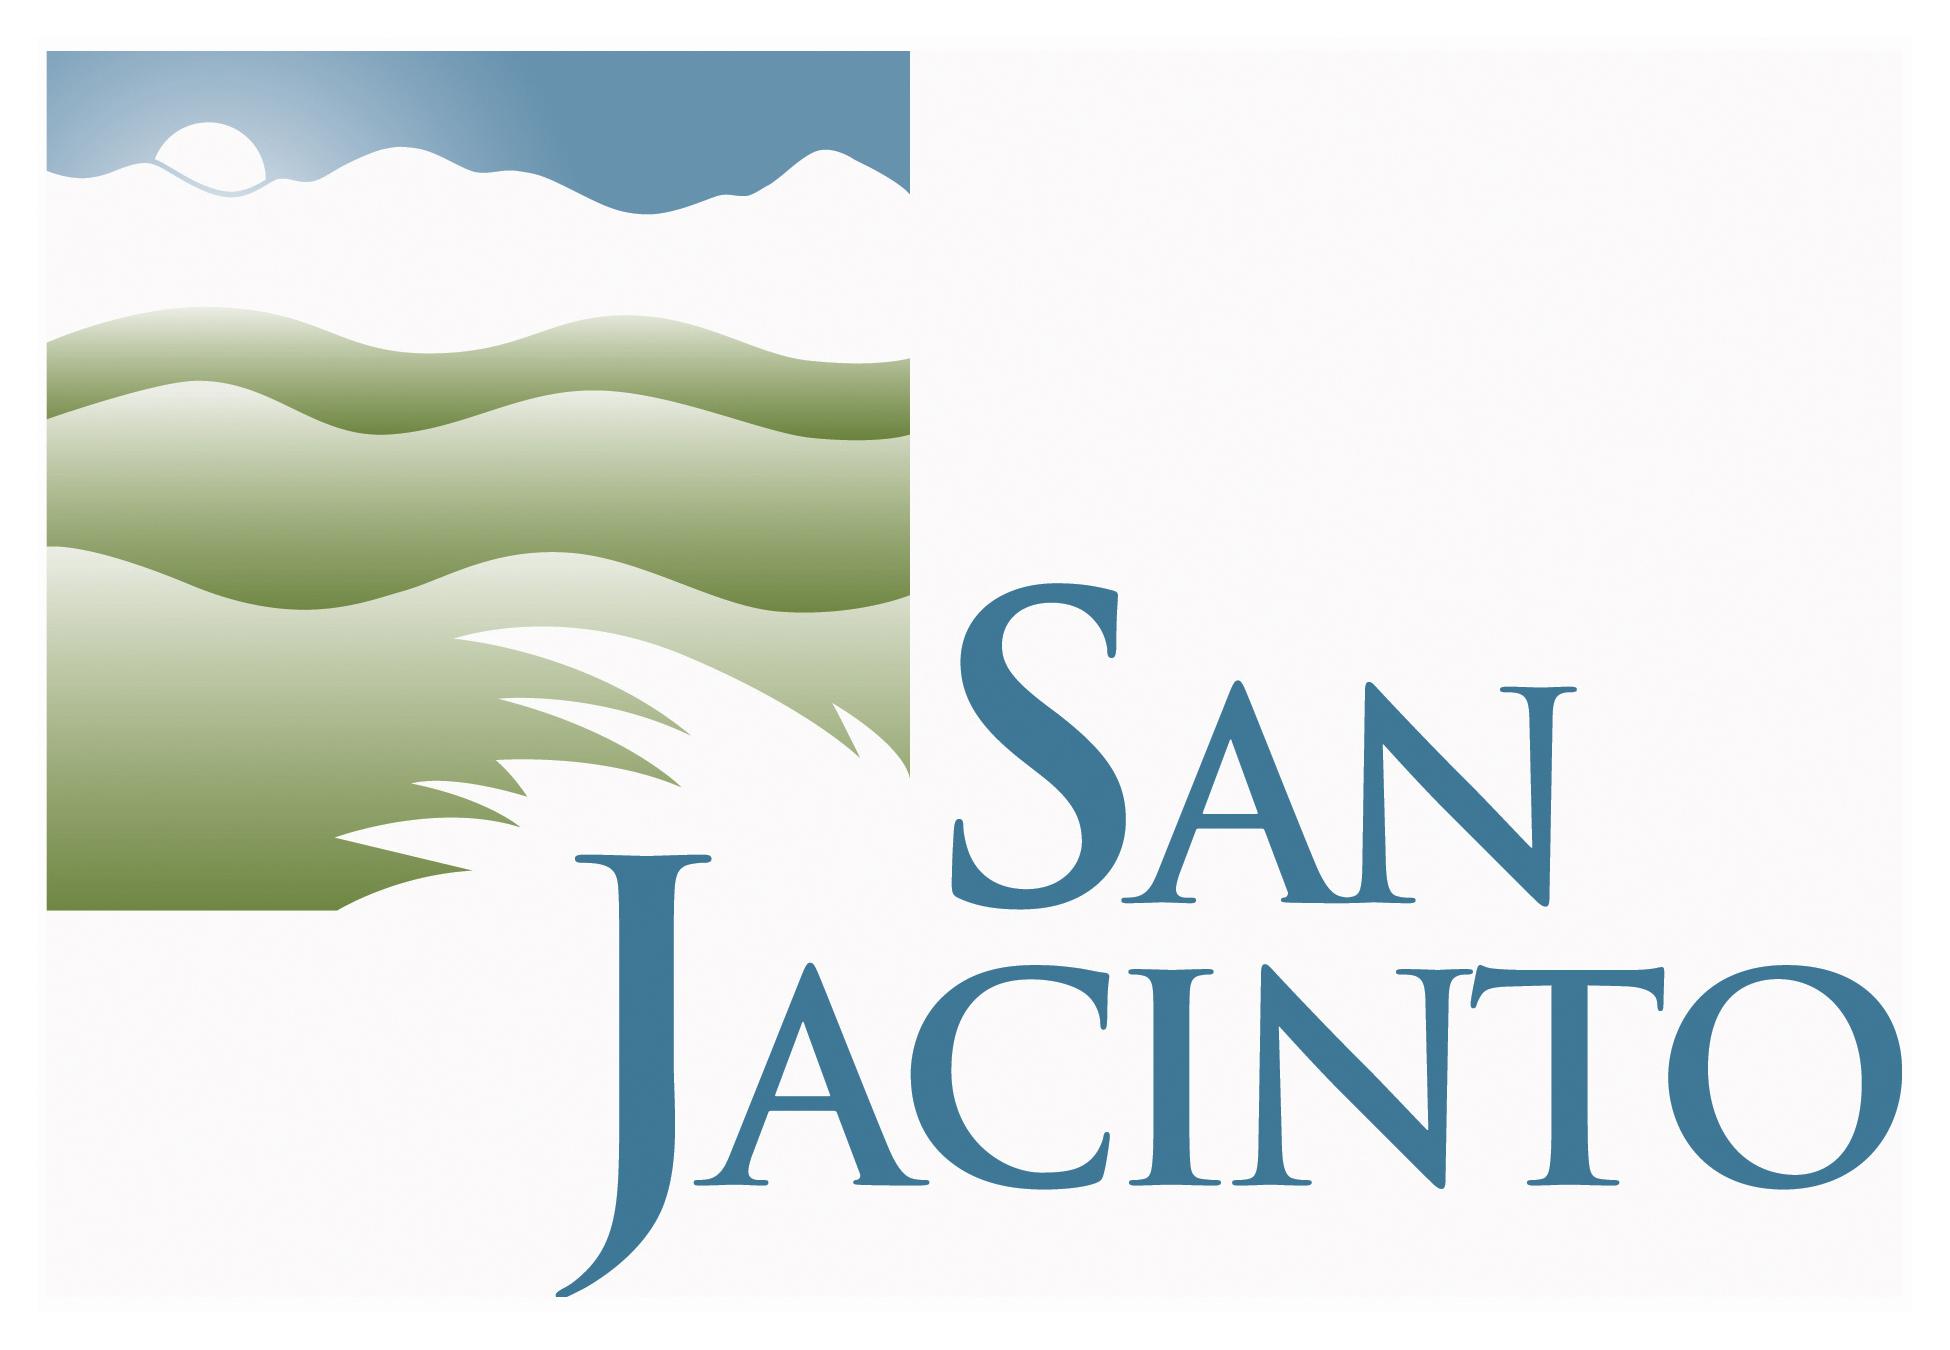 San Jacinto.jpg